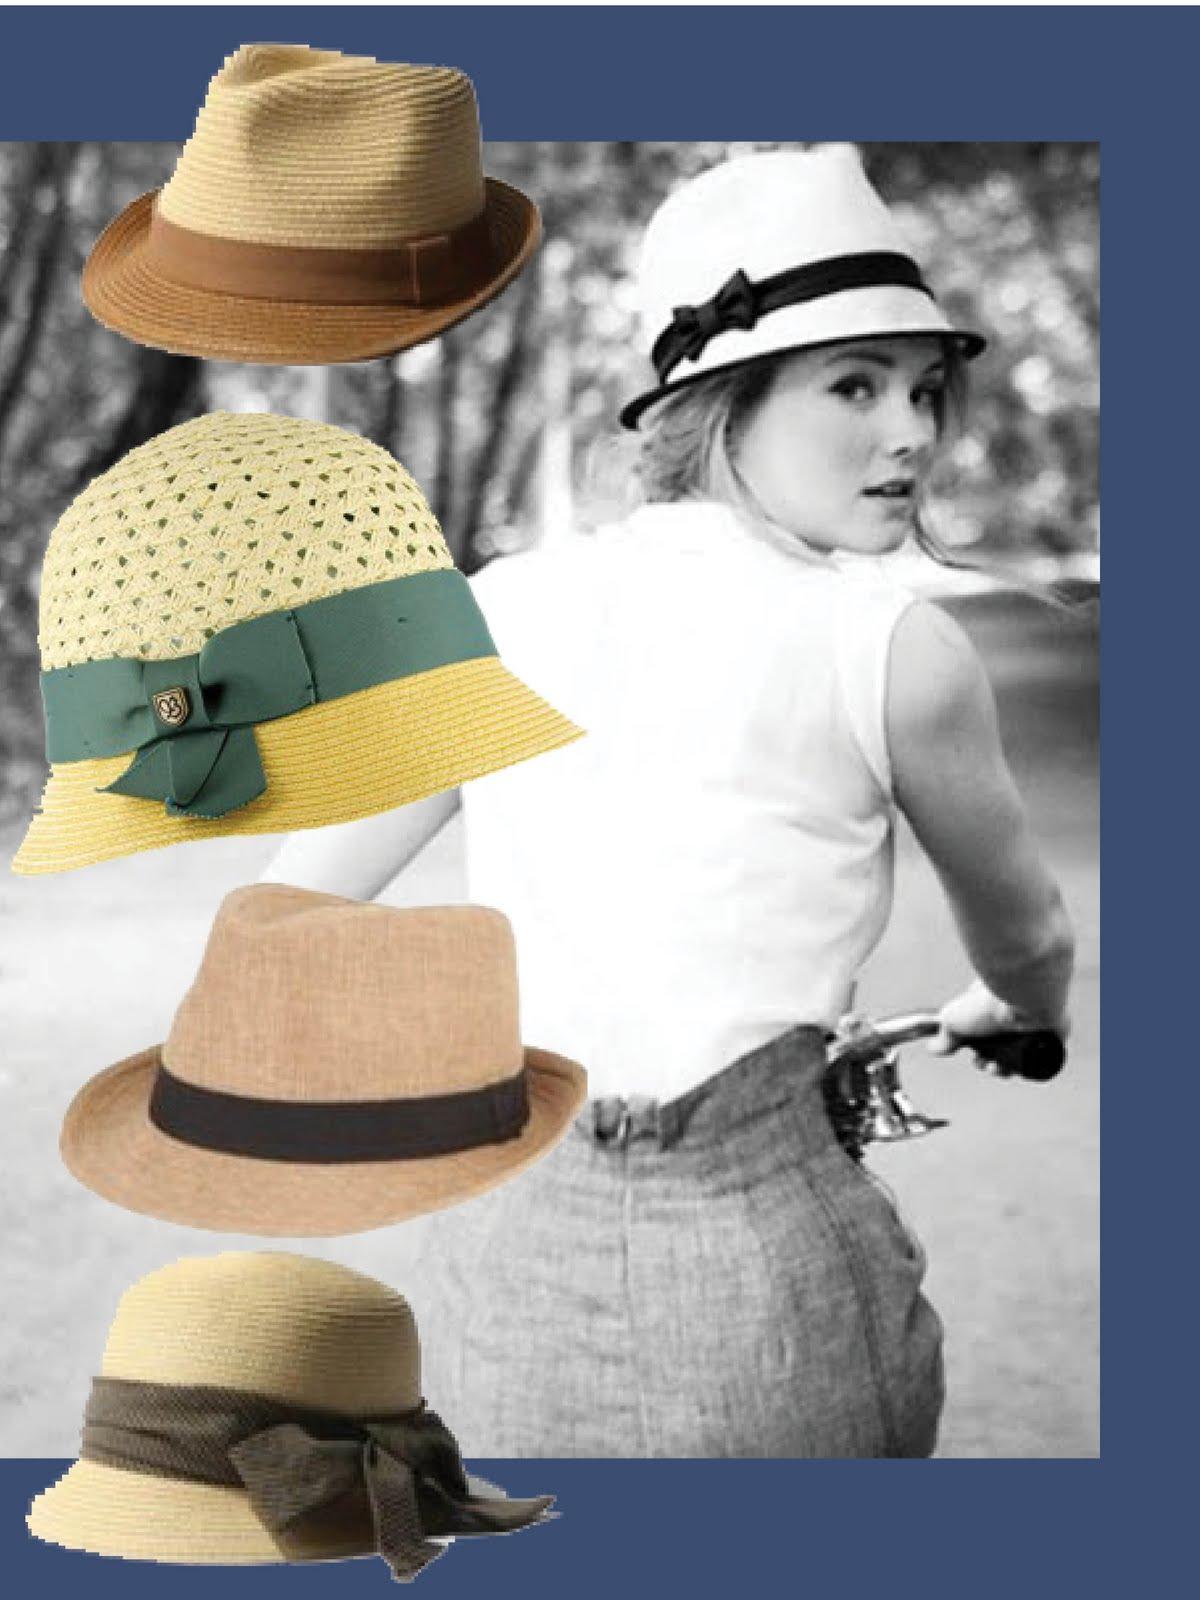 http://3.bp.blogspot.com/-ImQ0aftDt3E/TbYCGwiuyYI/AAAAAAAABX4/BQjnHi08alw/s1600/hats2.jpg